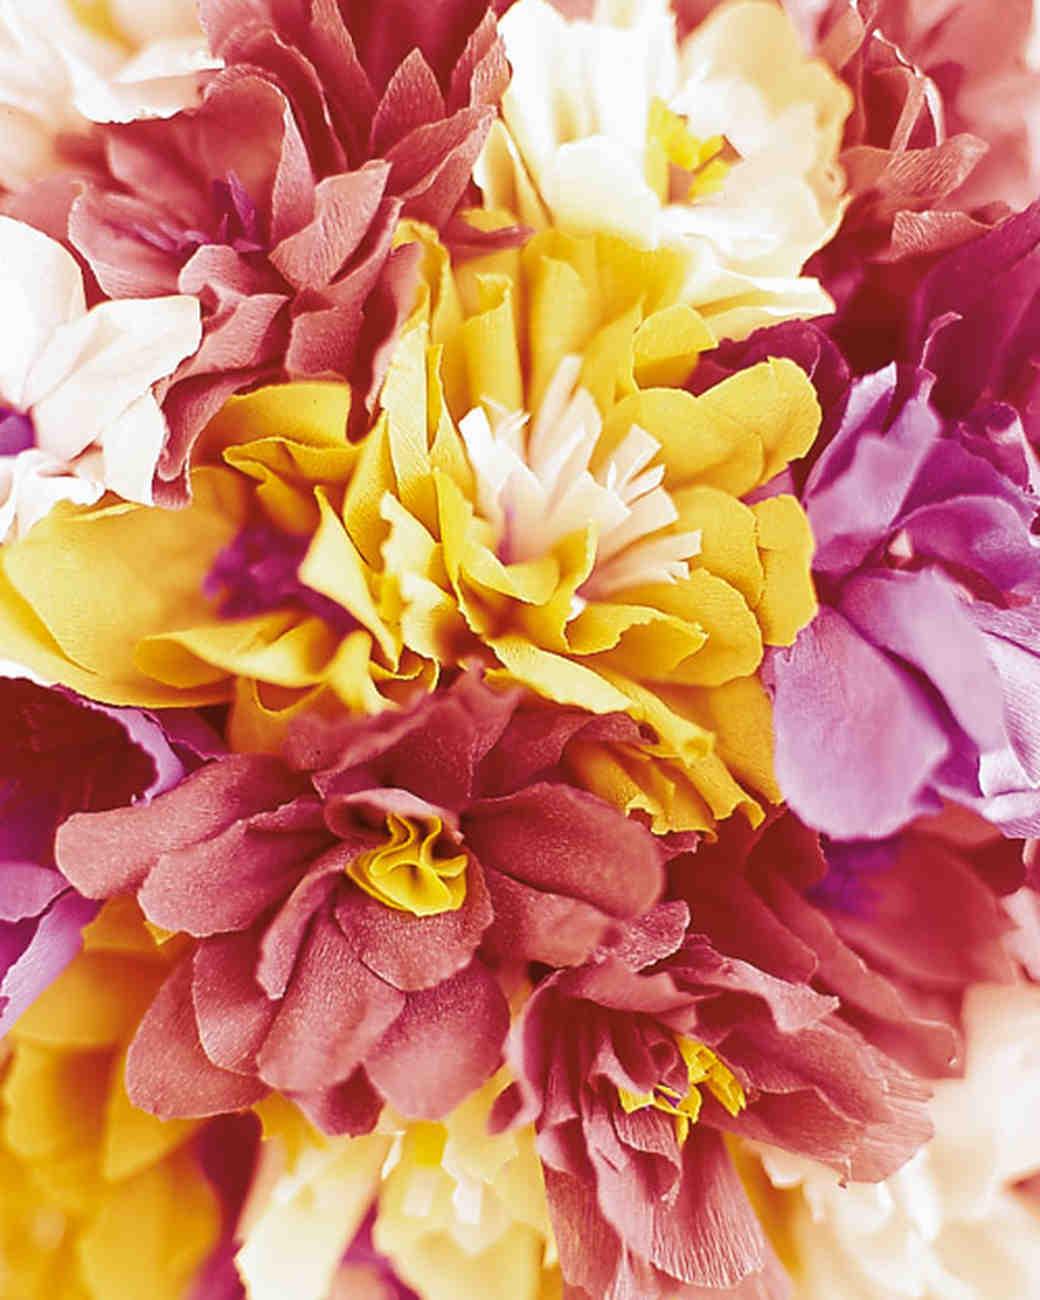 a98497_spr01_flowers.jpg